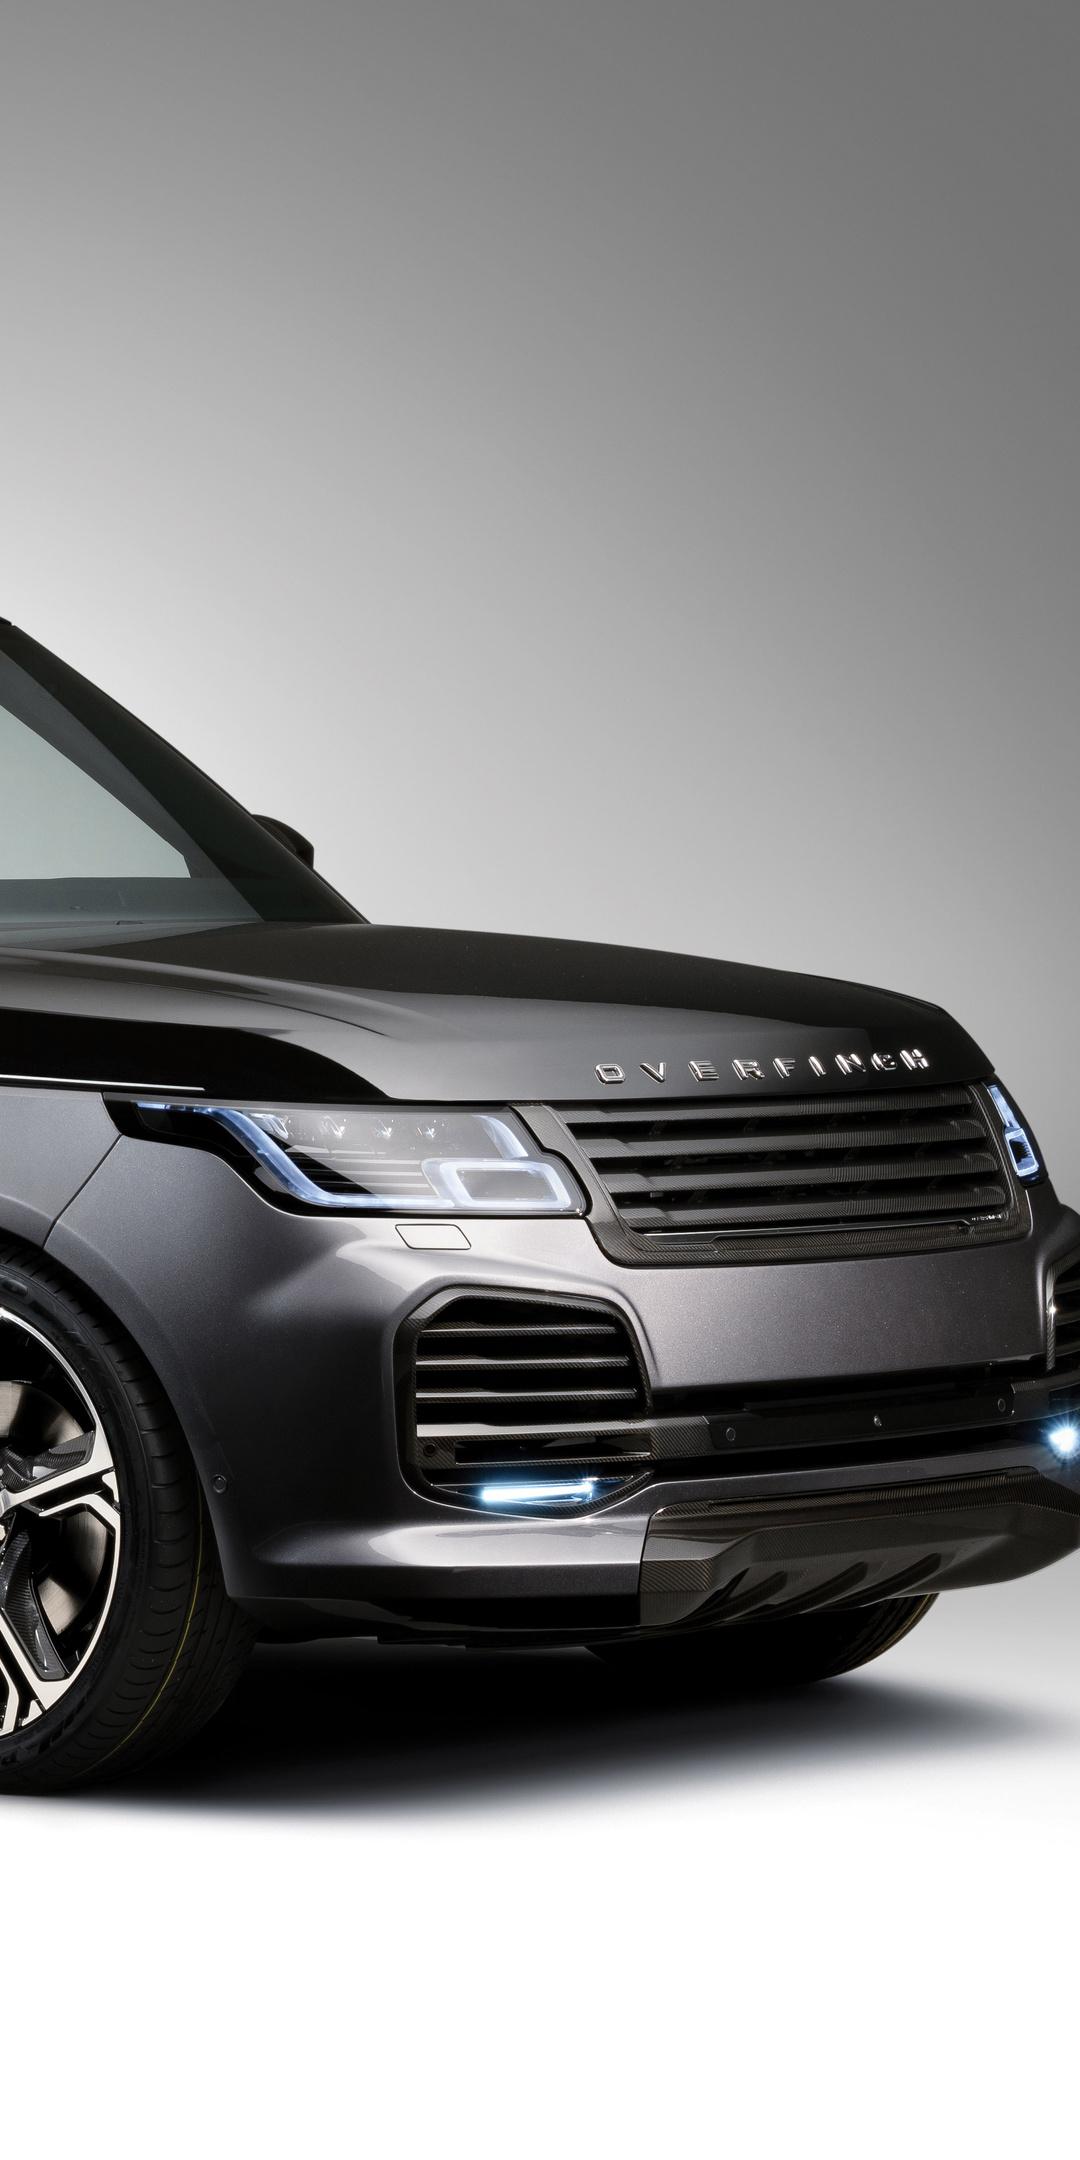 Range Rover Car Wallpaper